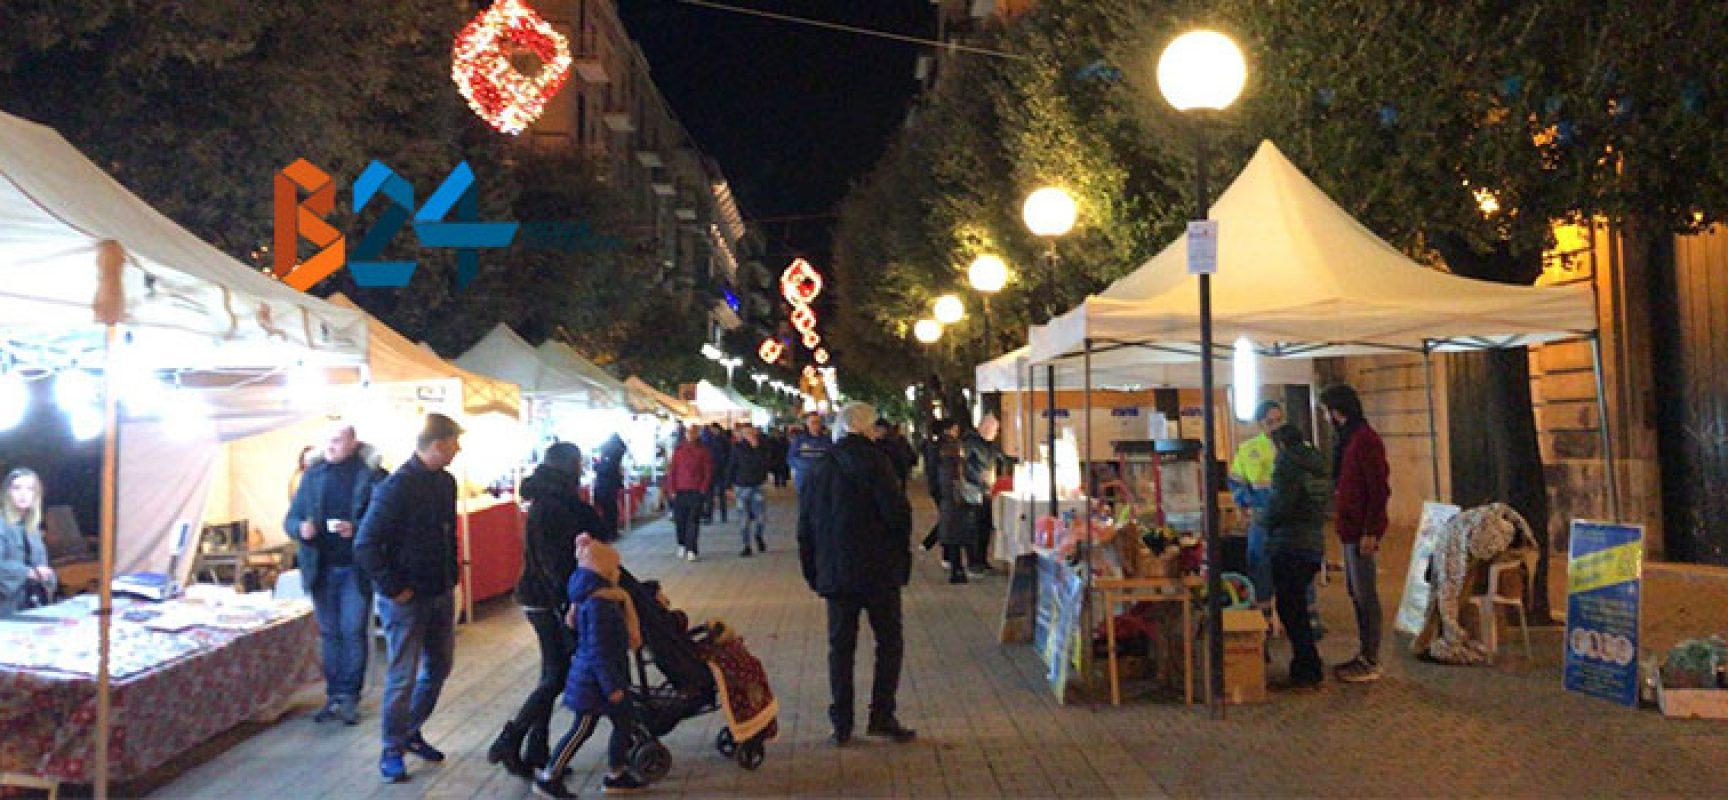 Natale a Bisceglie 2019, un primo weekend ricco di eventi / PROGRAMMA